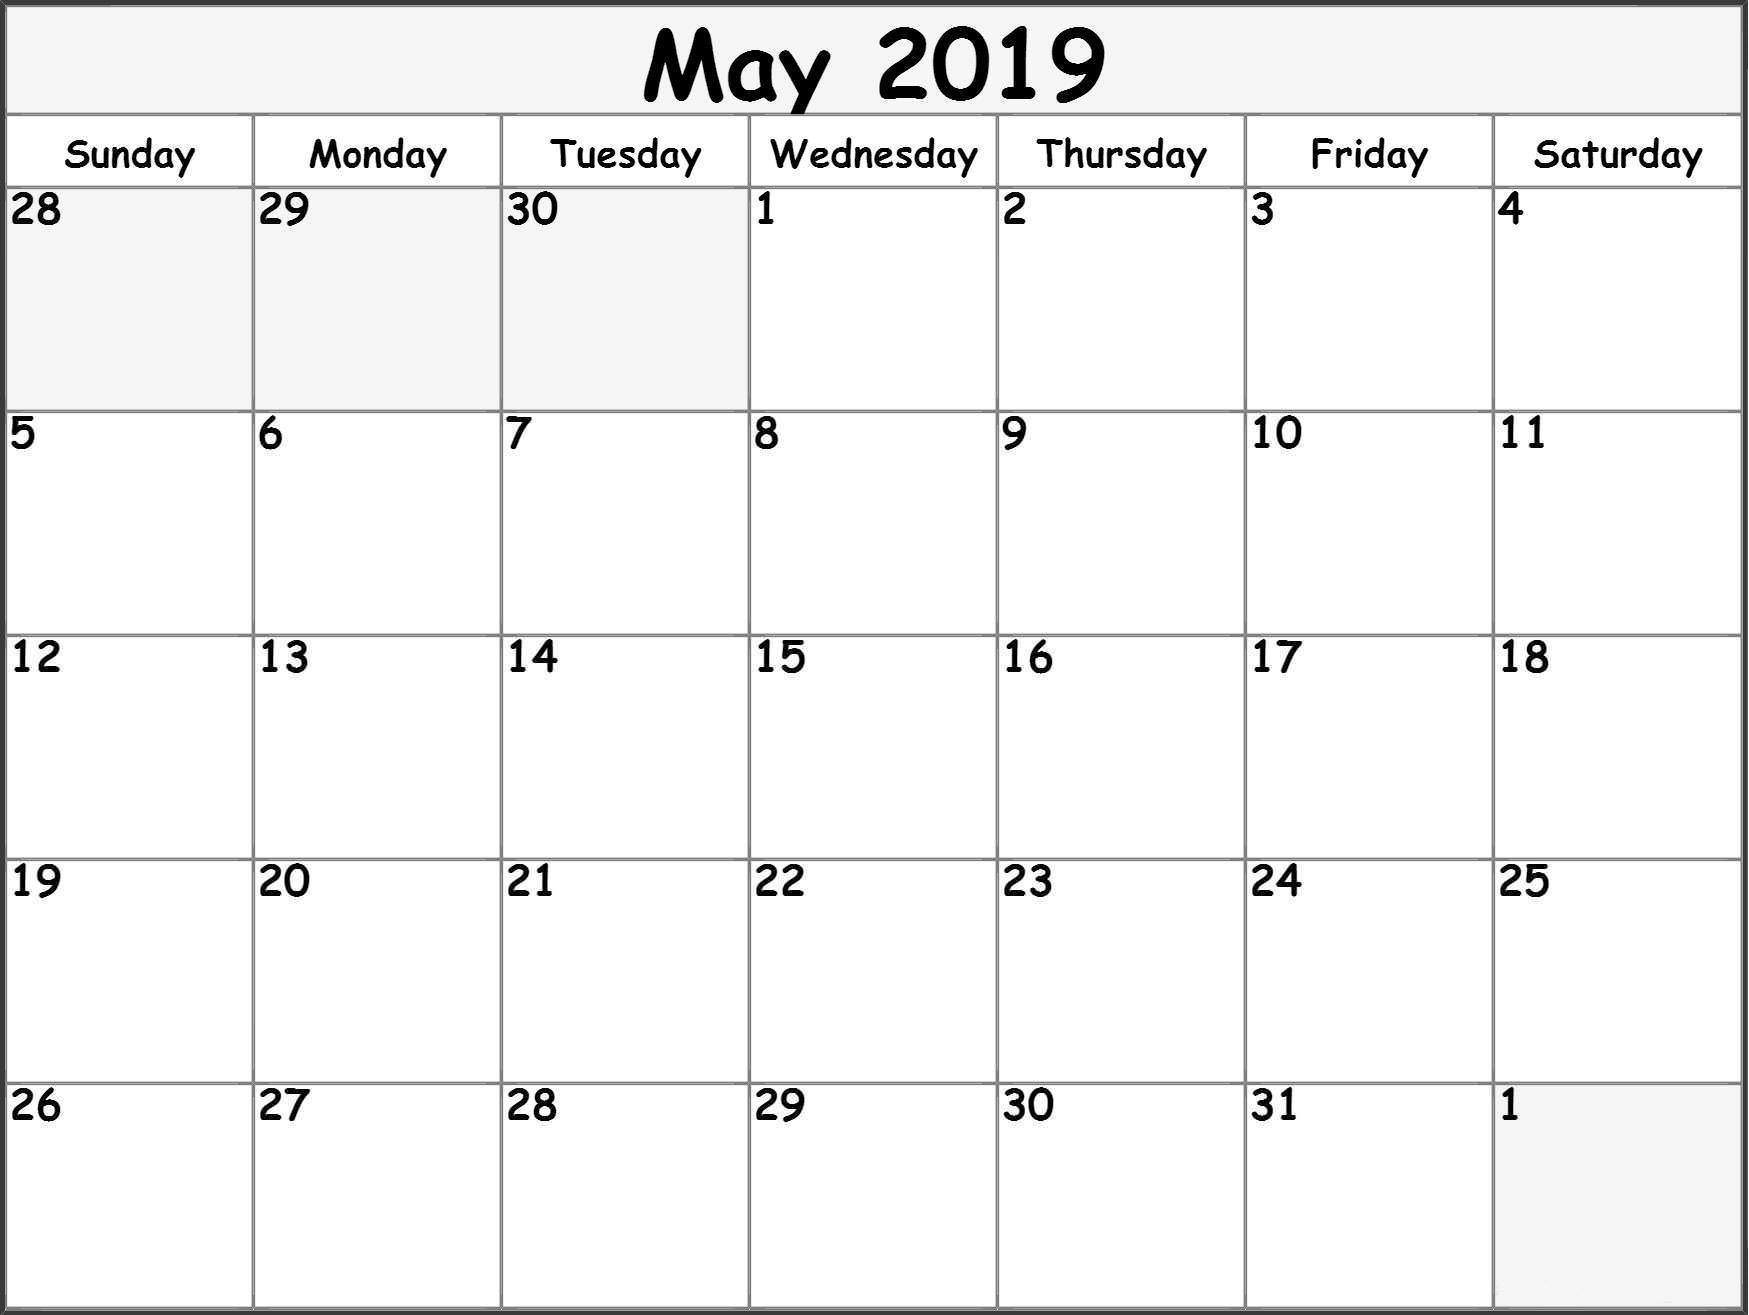 2019 Monthly Calendar Printable Free May 2019 Printable Calendar Templates Free Blank Pdf